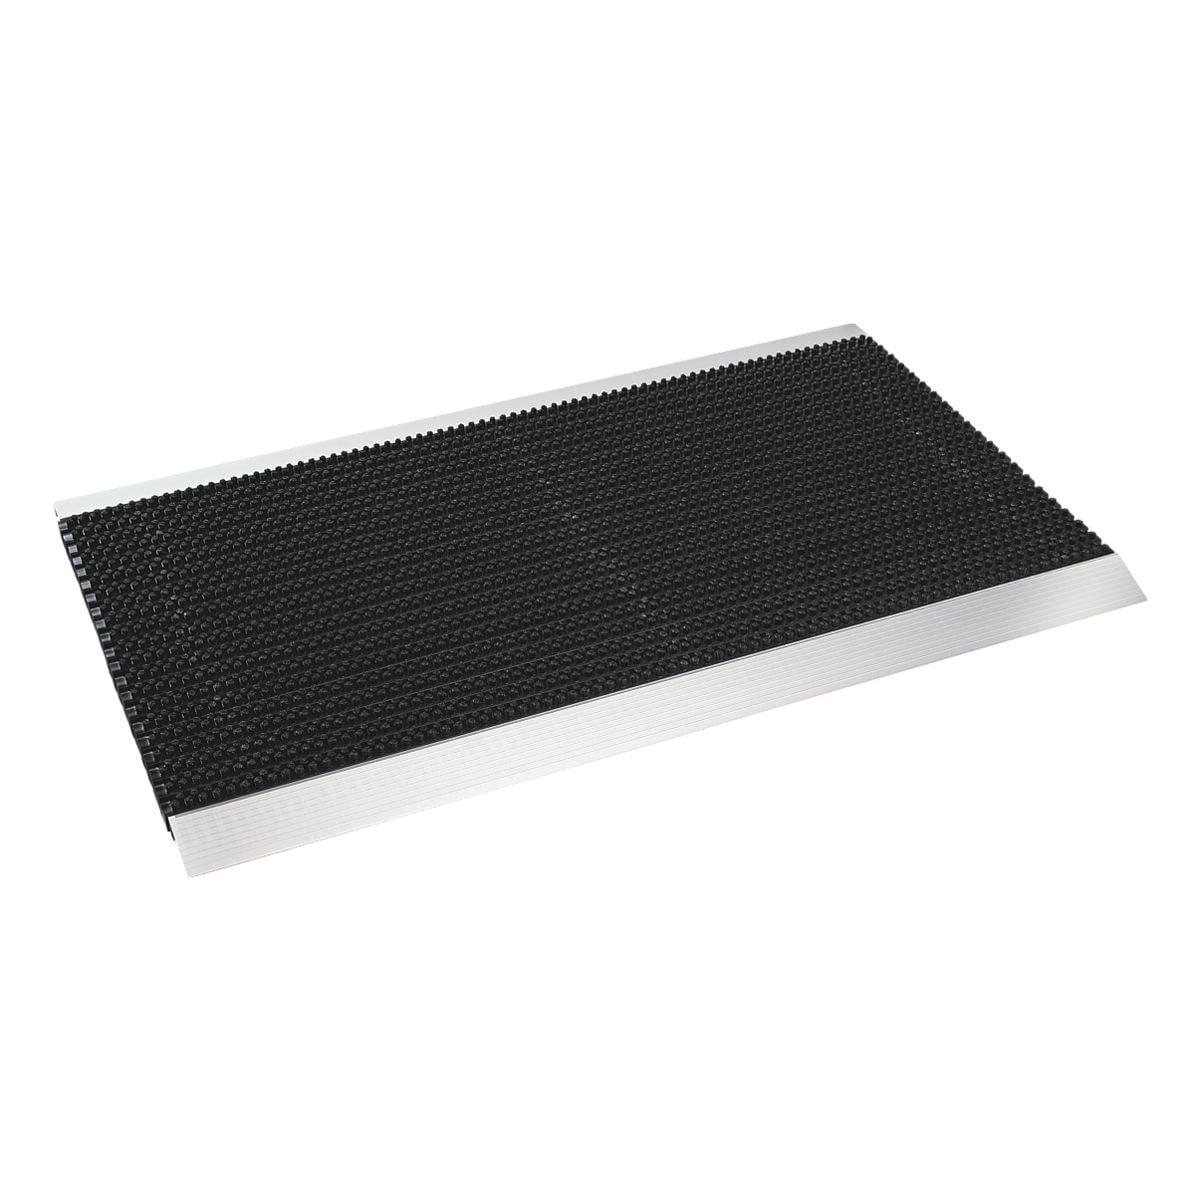 tapis brosse avec bordure en aluminium acheter prix conomique chez otto office. Black Bedroom Furniture Sets. Home Design Ideas